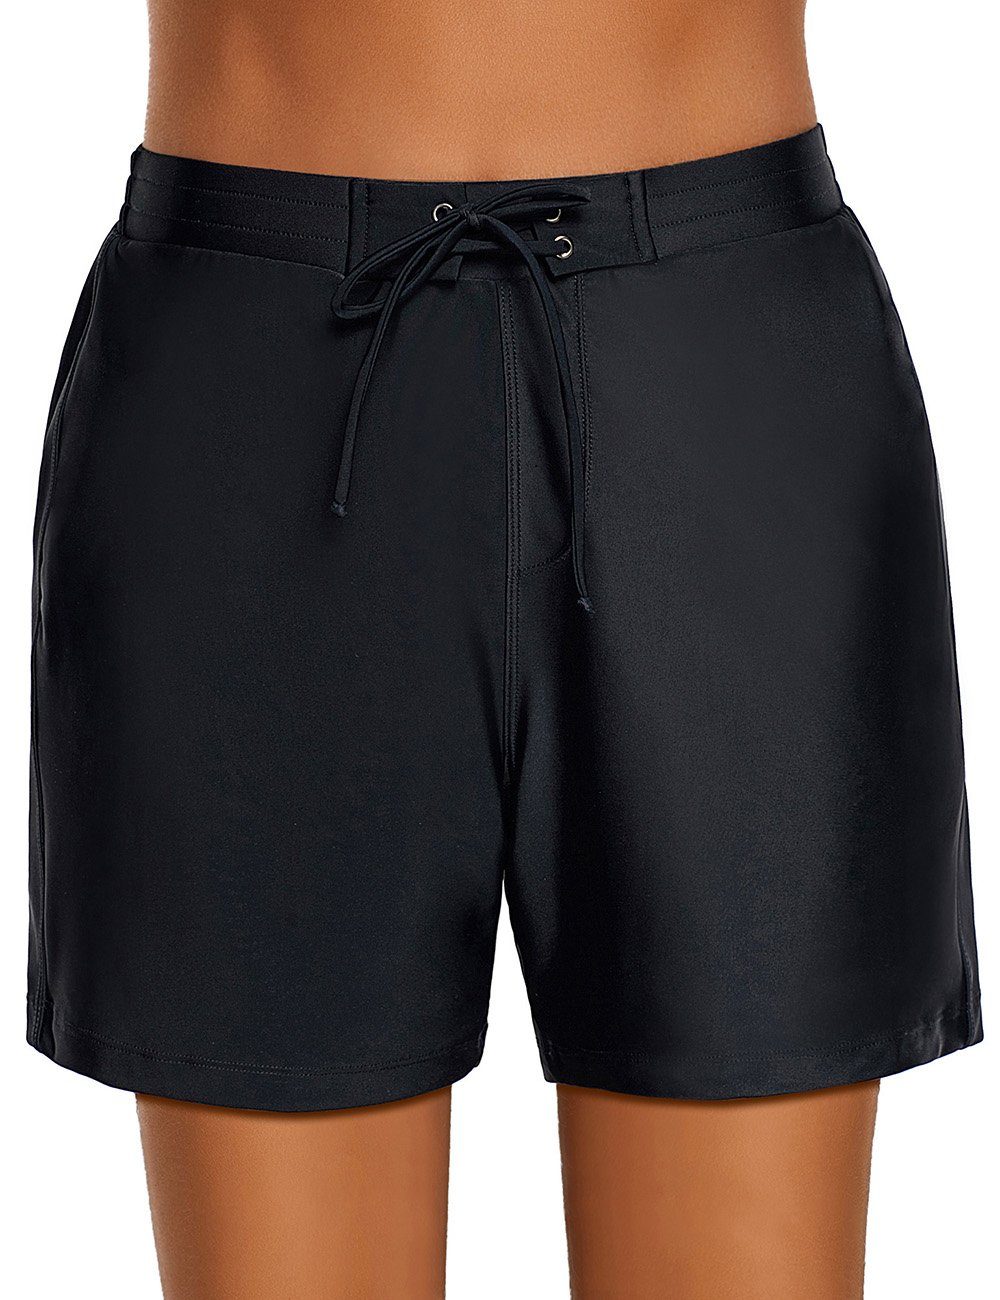 Utyful Women's Black Swim Shorts Summer Beach Stretch Swimsuit Bottom Board Shorts Size XL